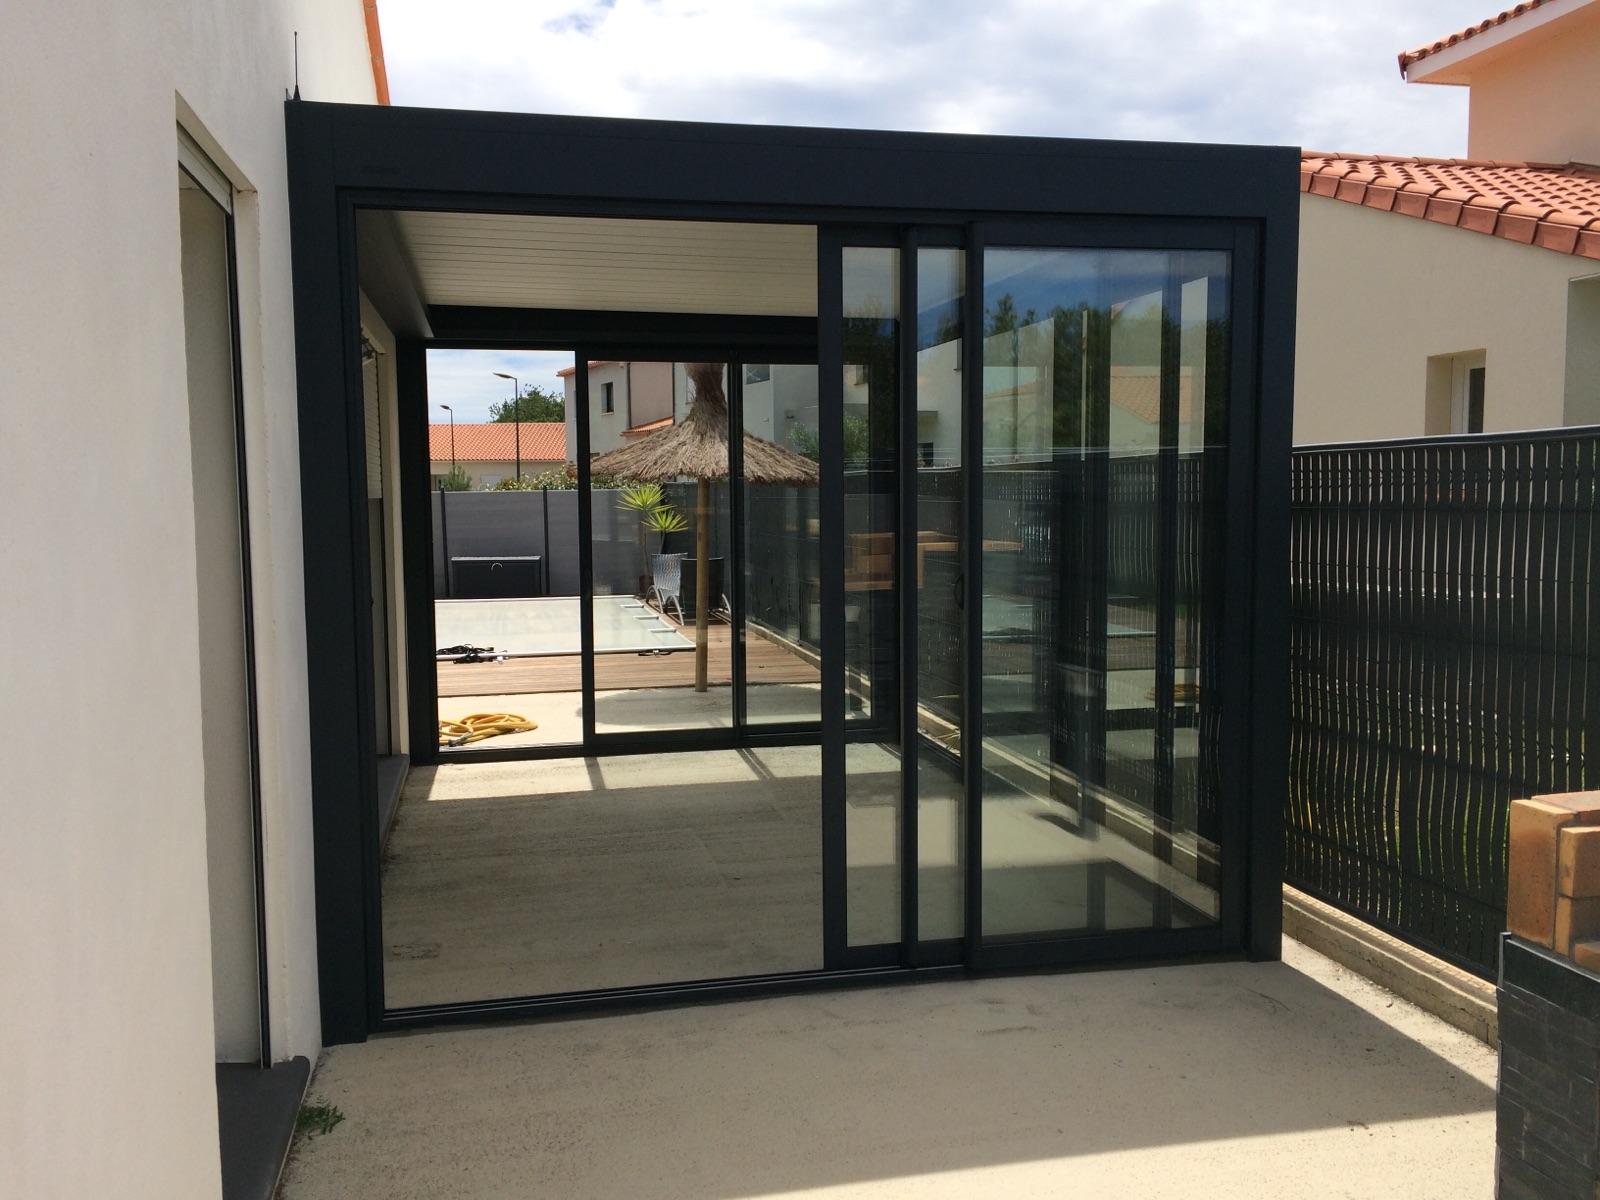 Pergola lames orientables avec baie vitr e komilfo - Baie vitree pour terrasse ...